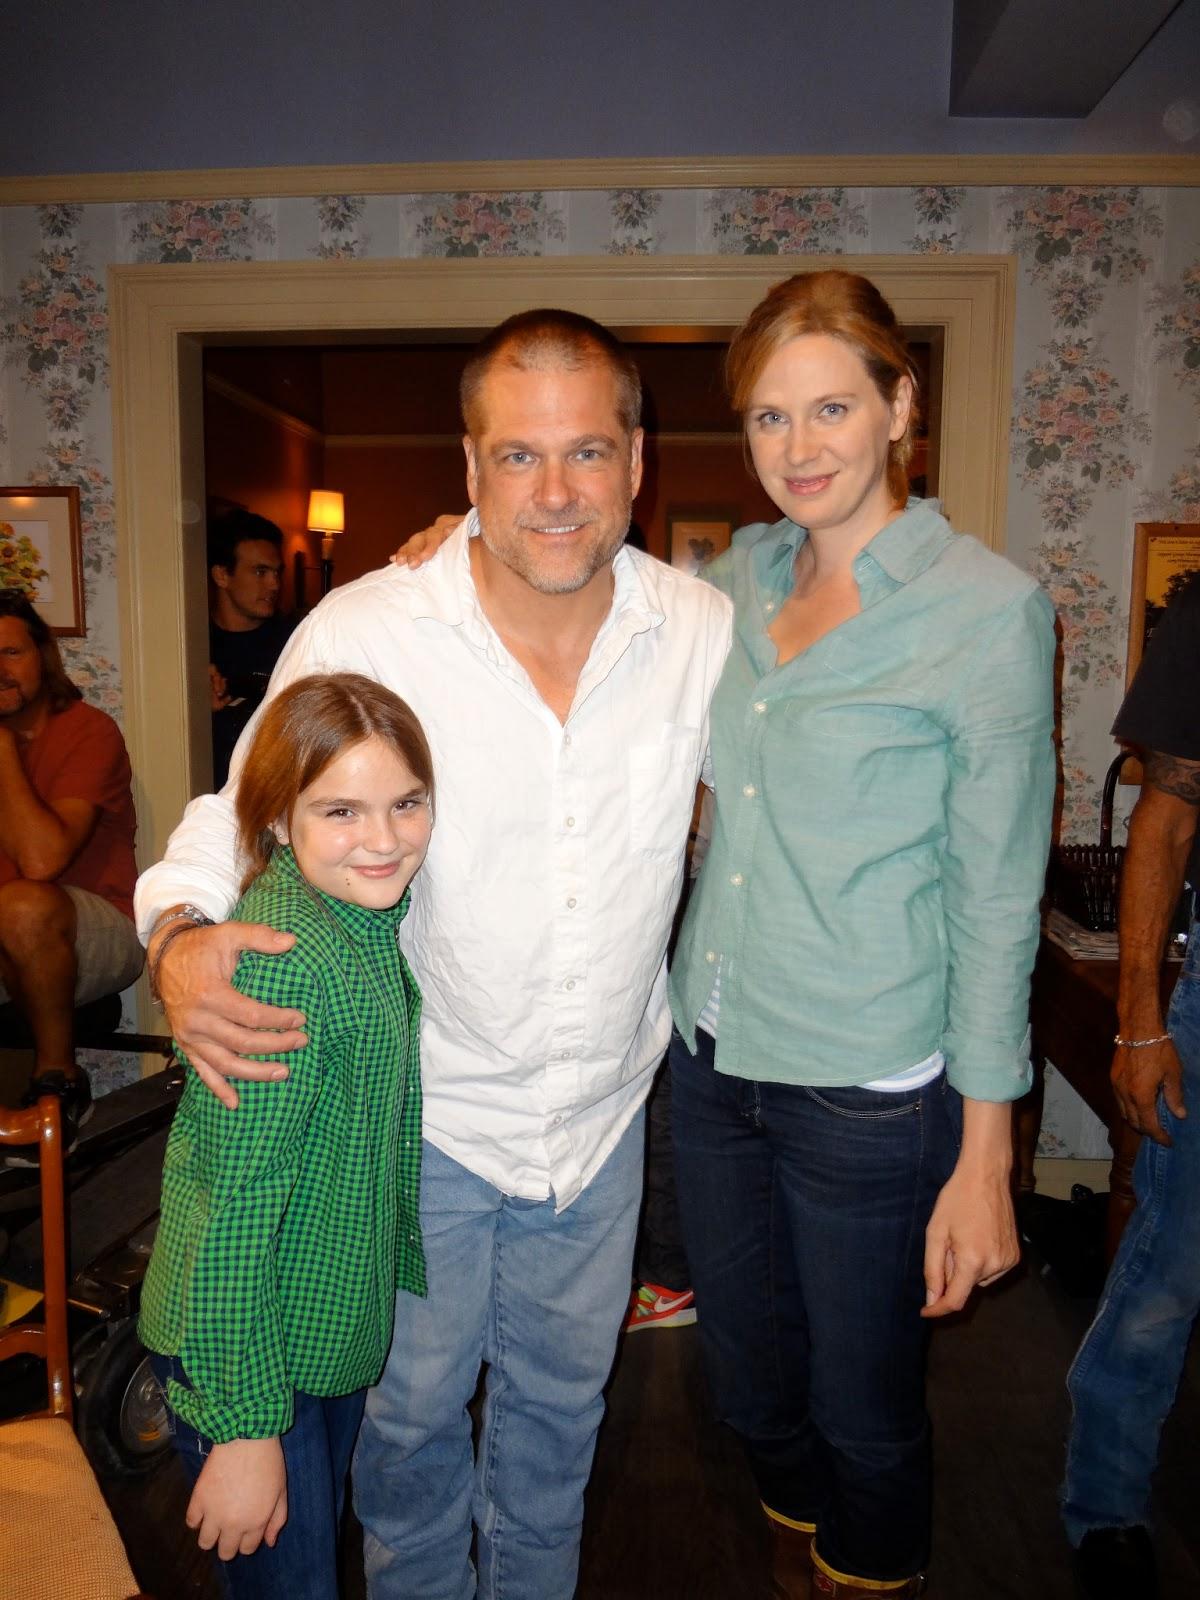 John Terlesky with his spouse Jayne Brook and child Alexandra Terlesky